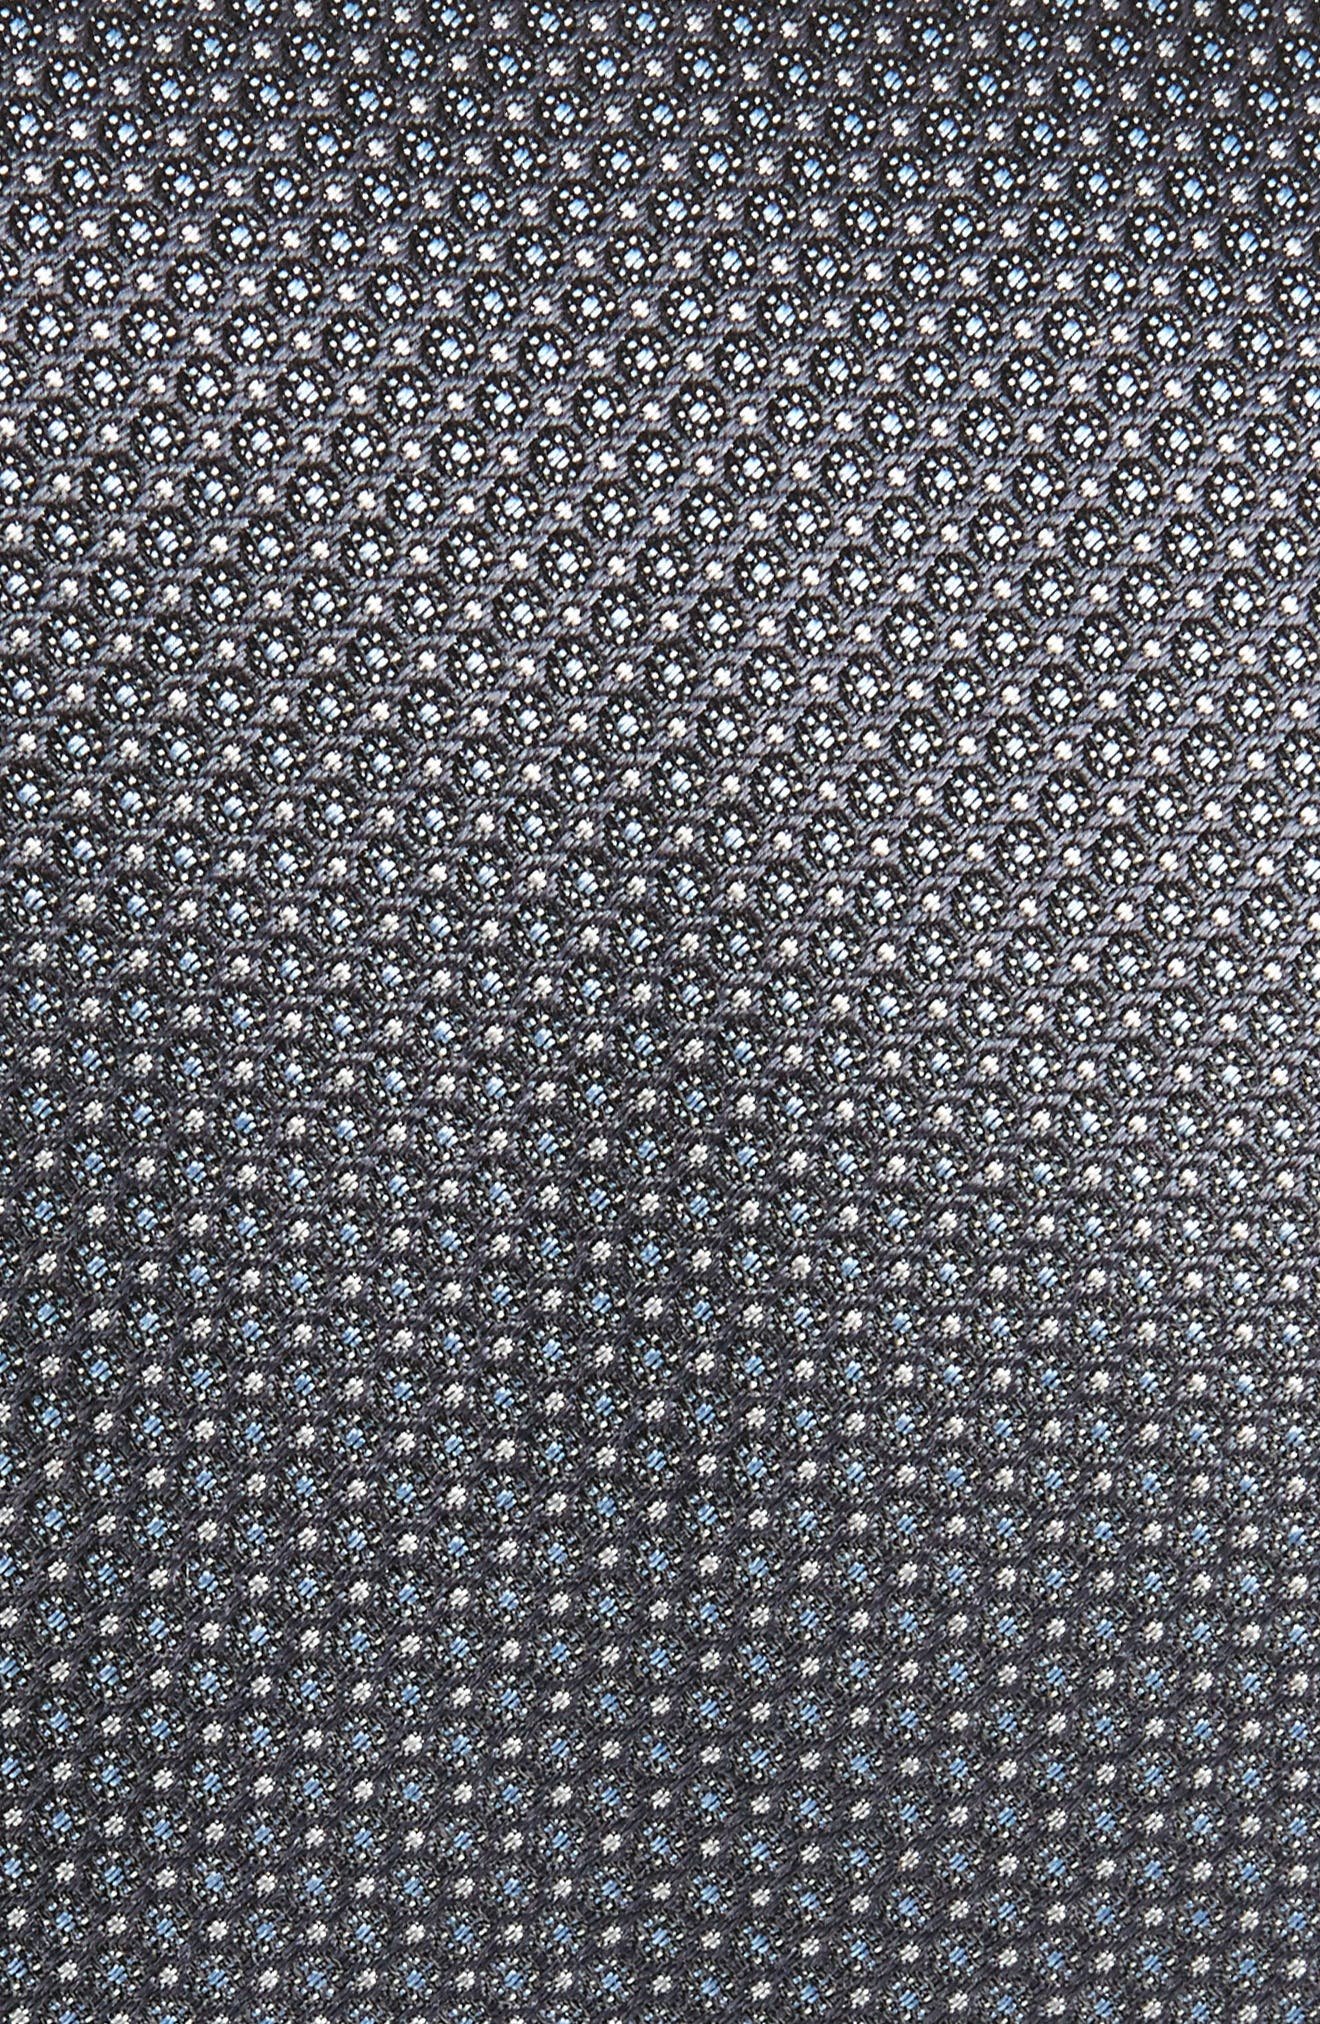 Clinton Silk Tie,                             Alternate thumbnail 2, color,                             Charcoal